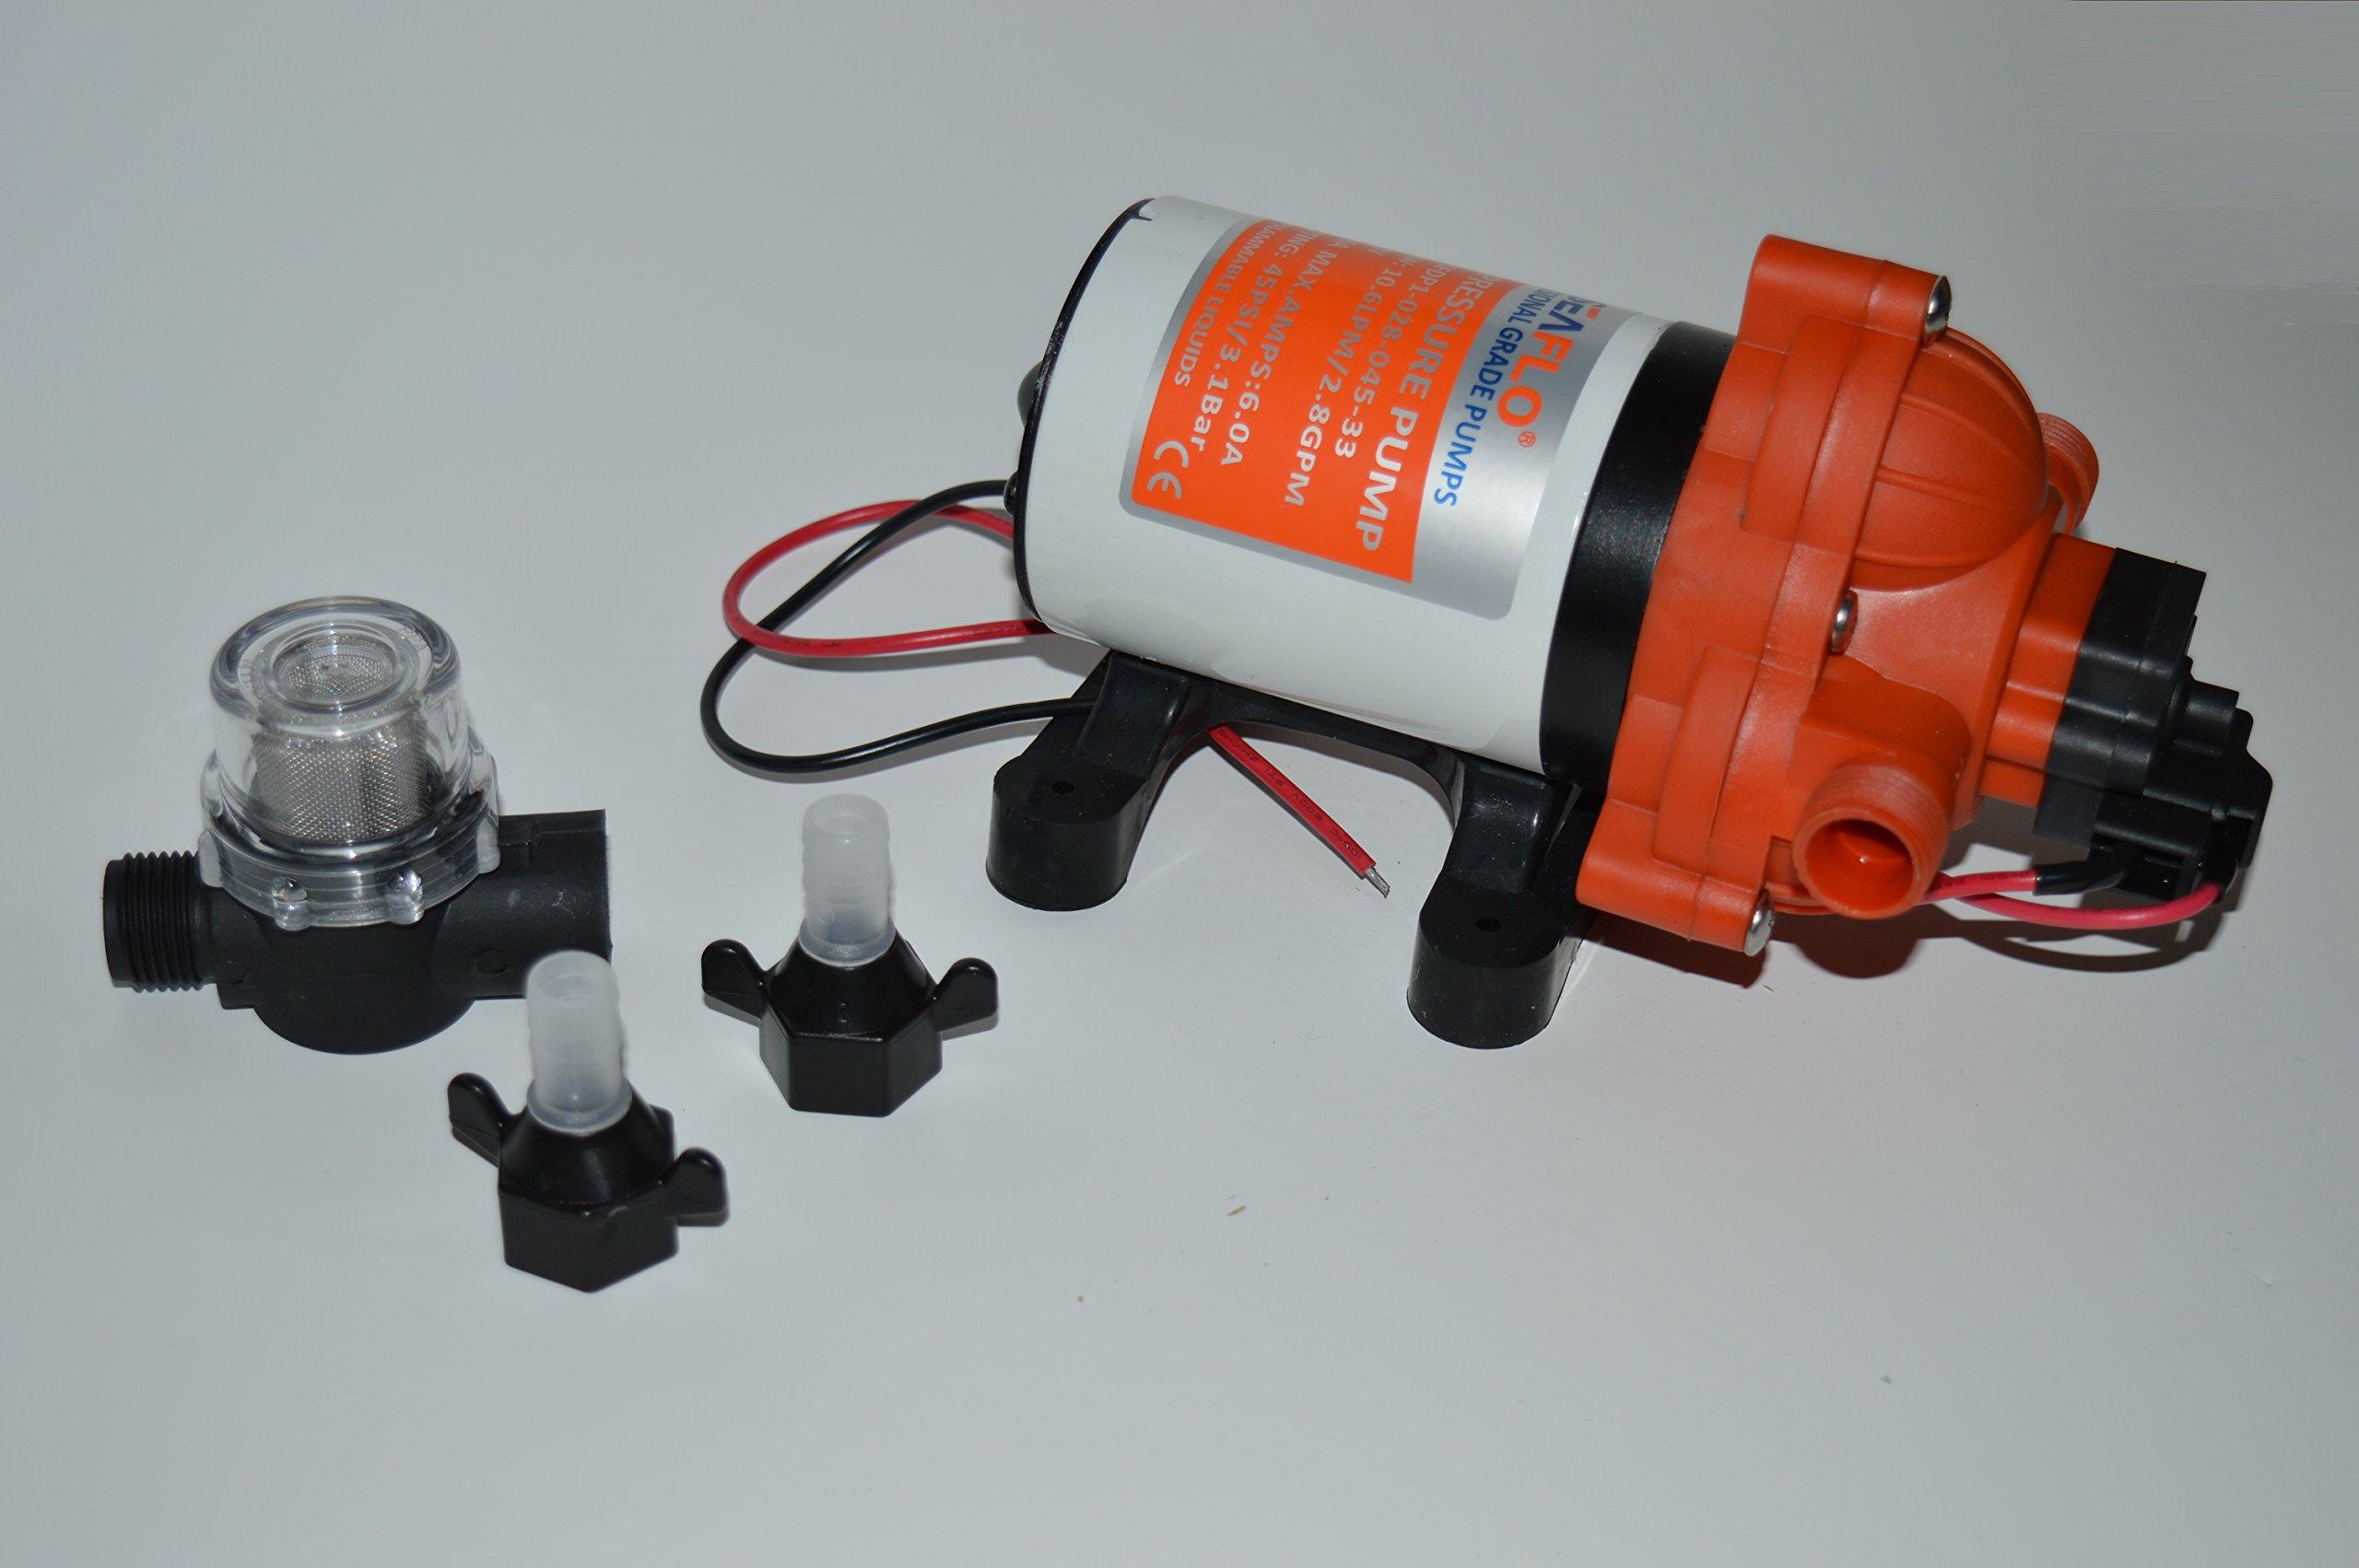 Seaflo 12v 3.0 GPM 45 PSI Water Pressure Pump by SEAFLO